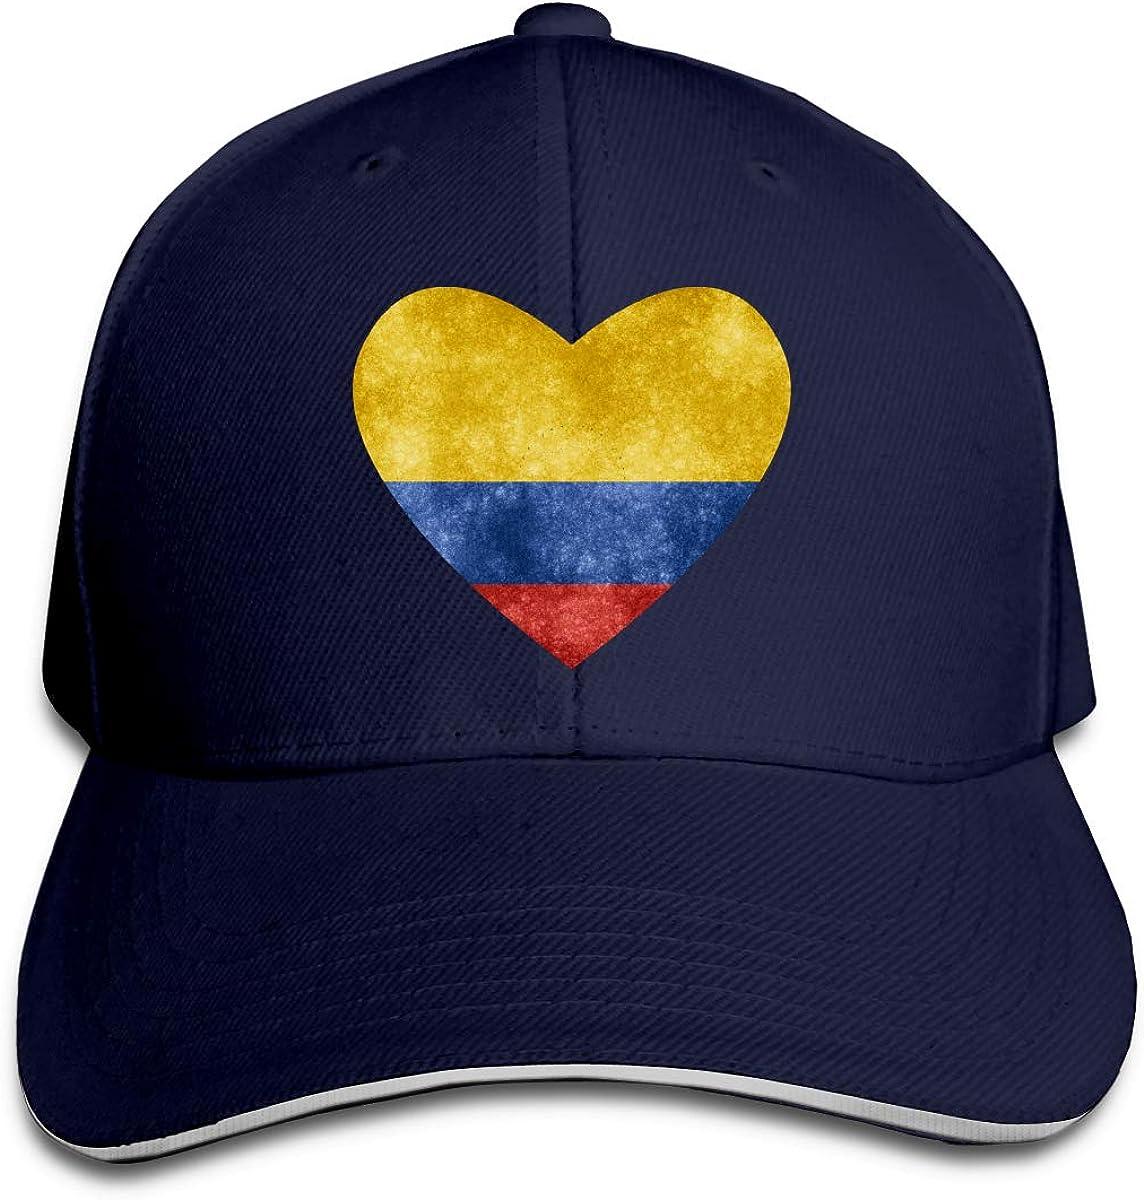 Colombian Heart Flag Hat Baseball Cap Duck Tongue Cap Sunhat Fashion Cap